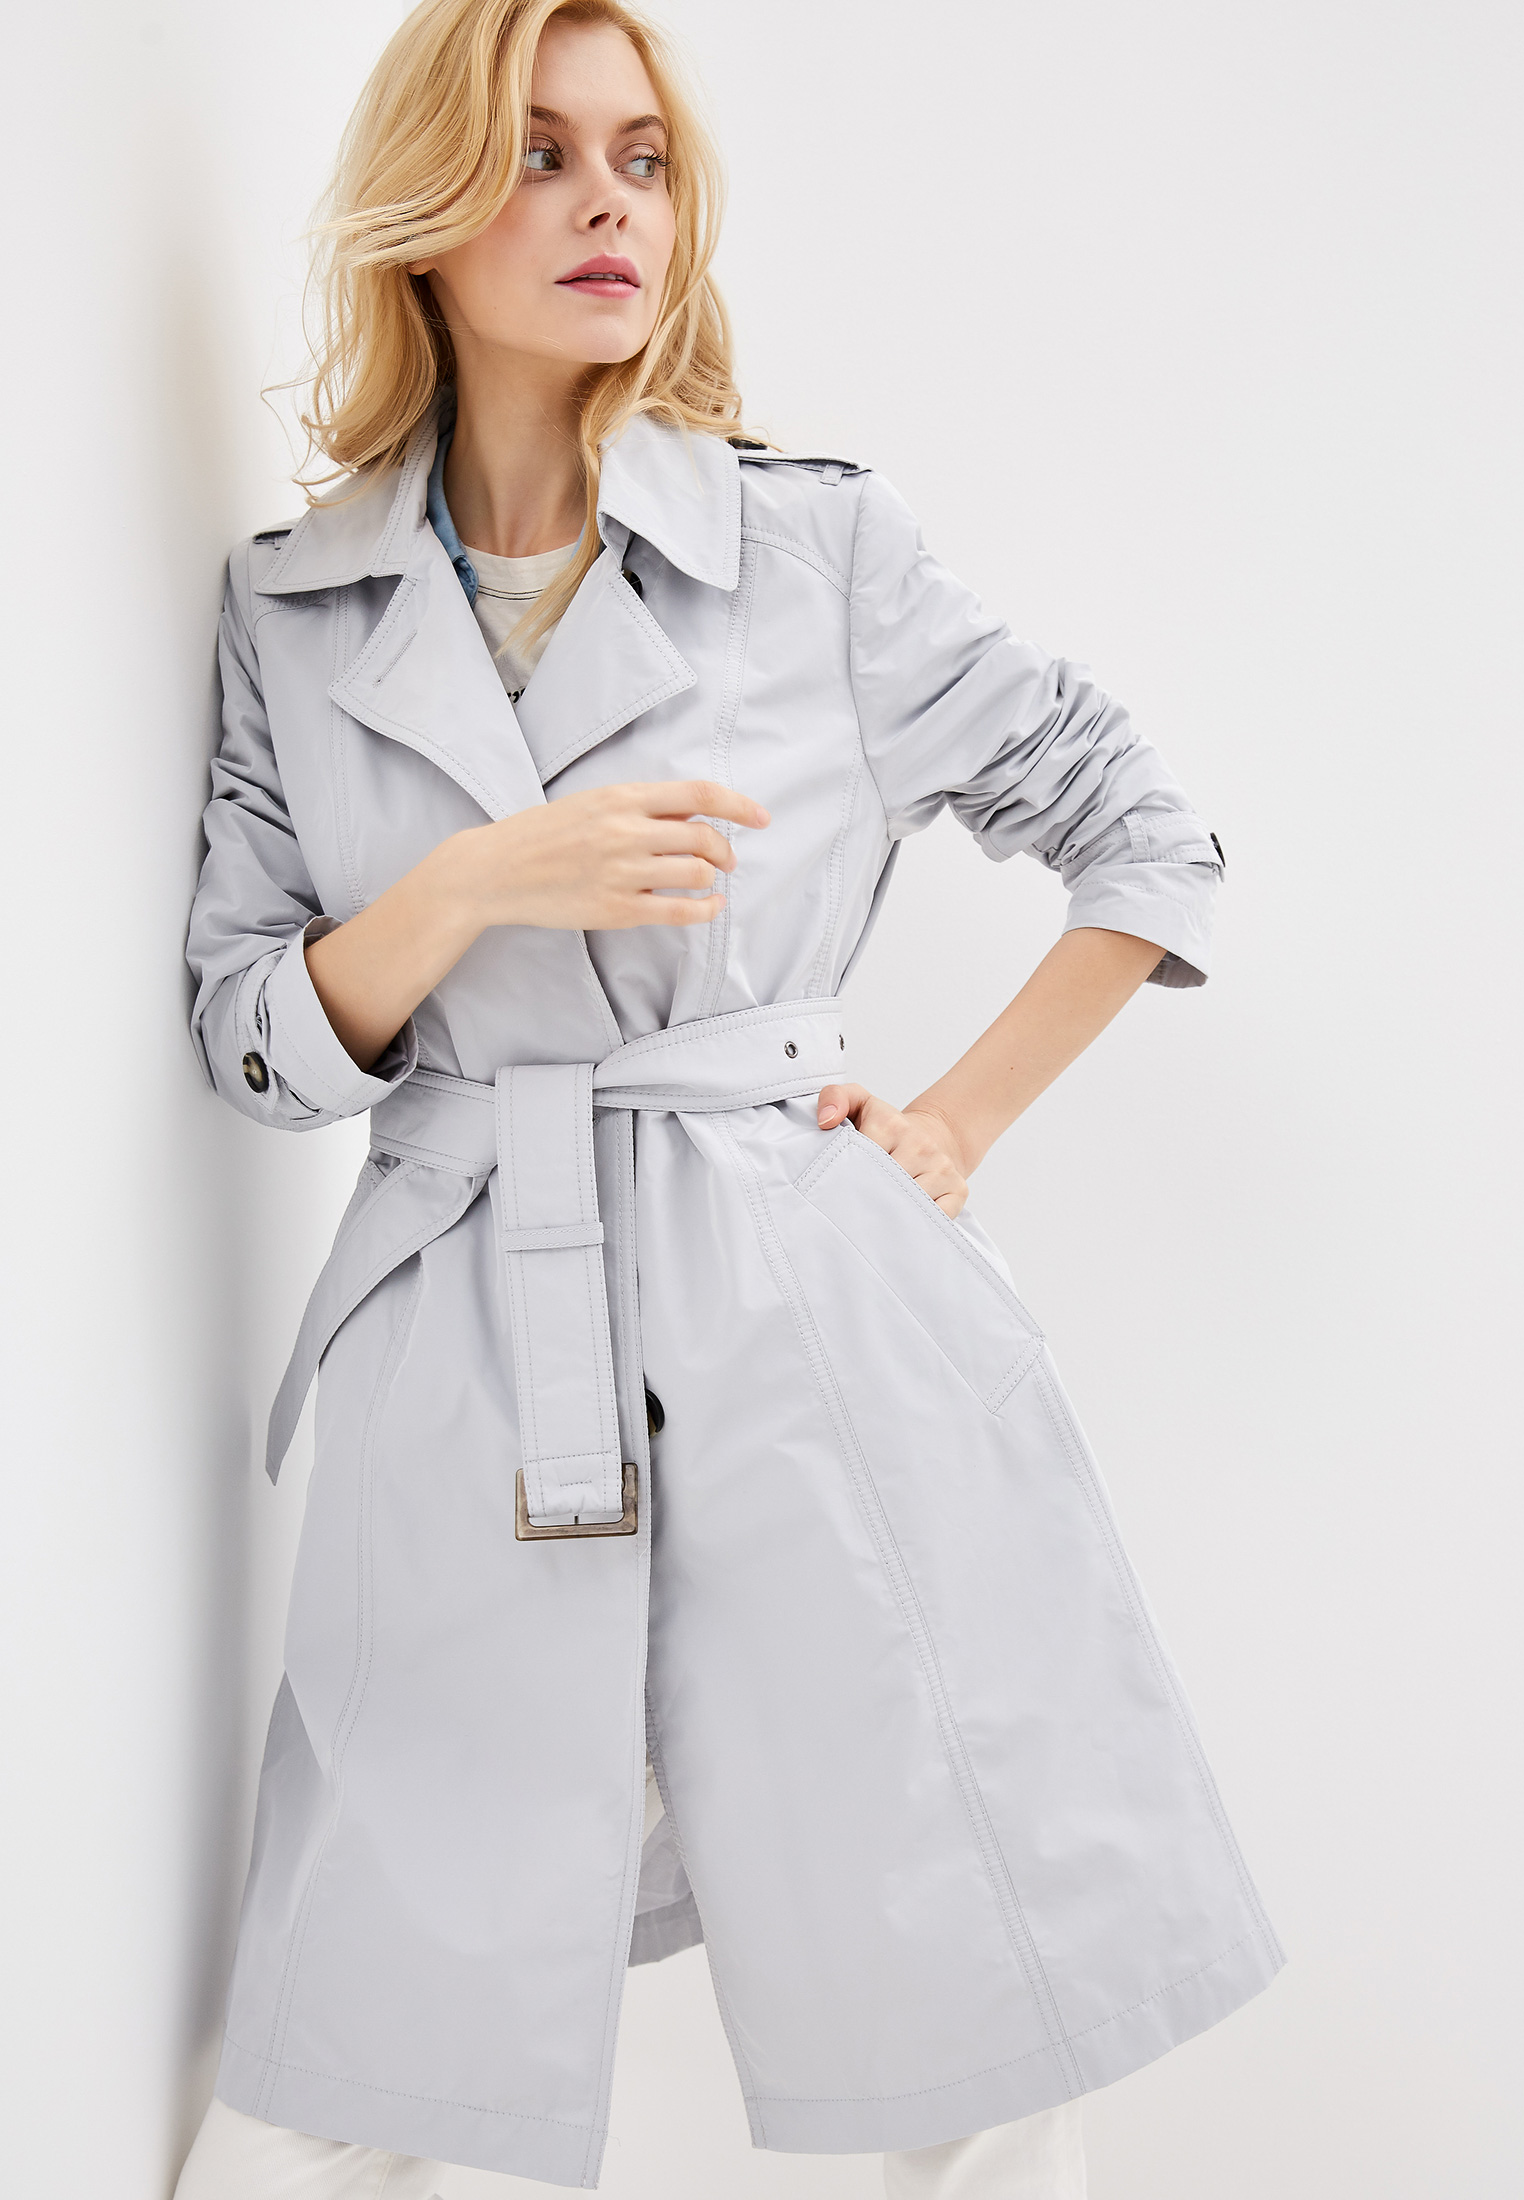 Плащ, Dixi-Coat, цвет: серый. Артикул: MP002XW01QC7. Одежда